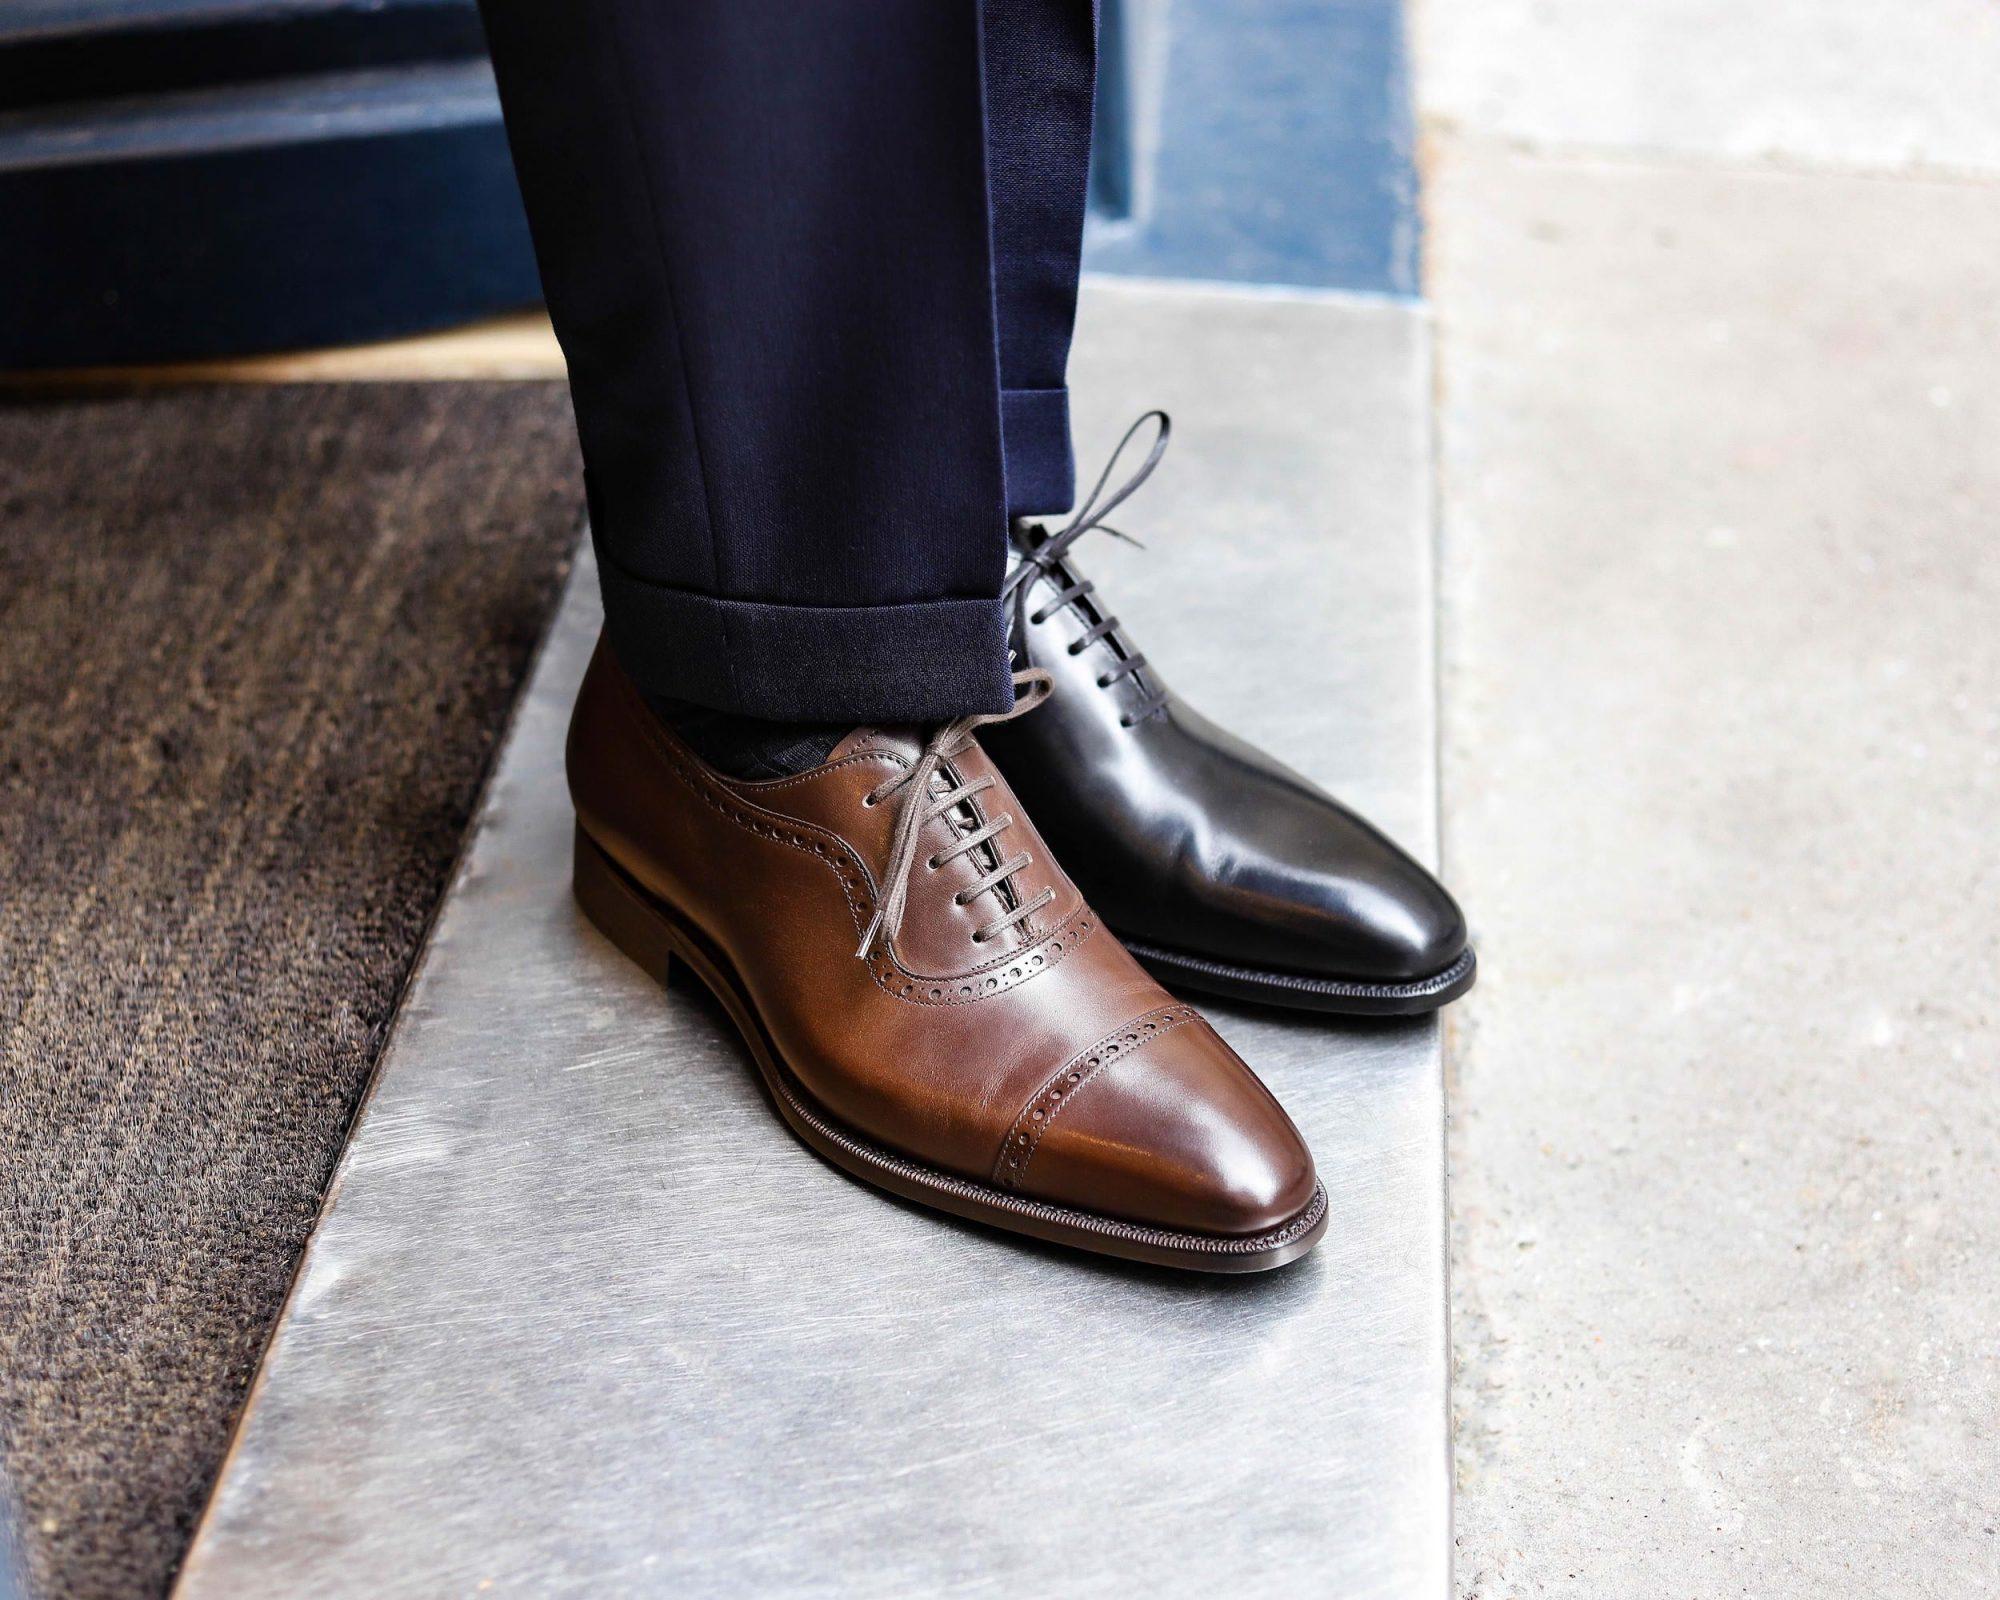 chaussure de mariage marron ou chaussure noir